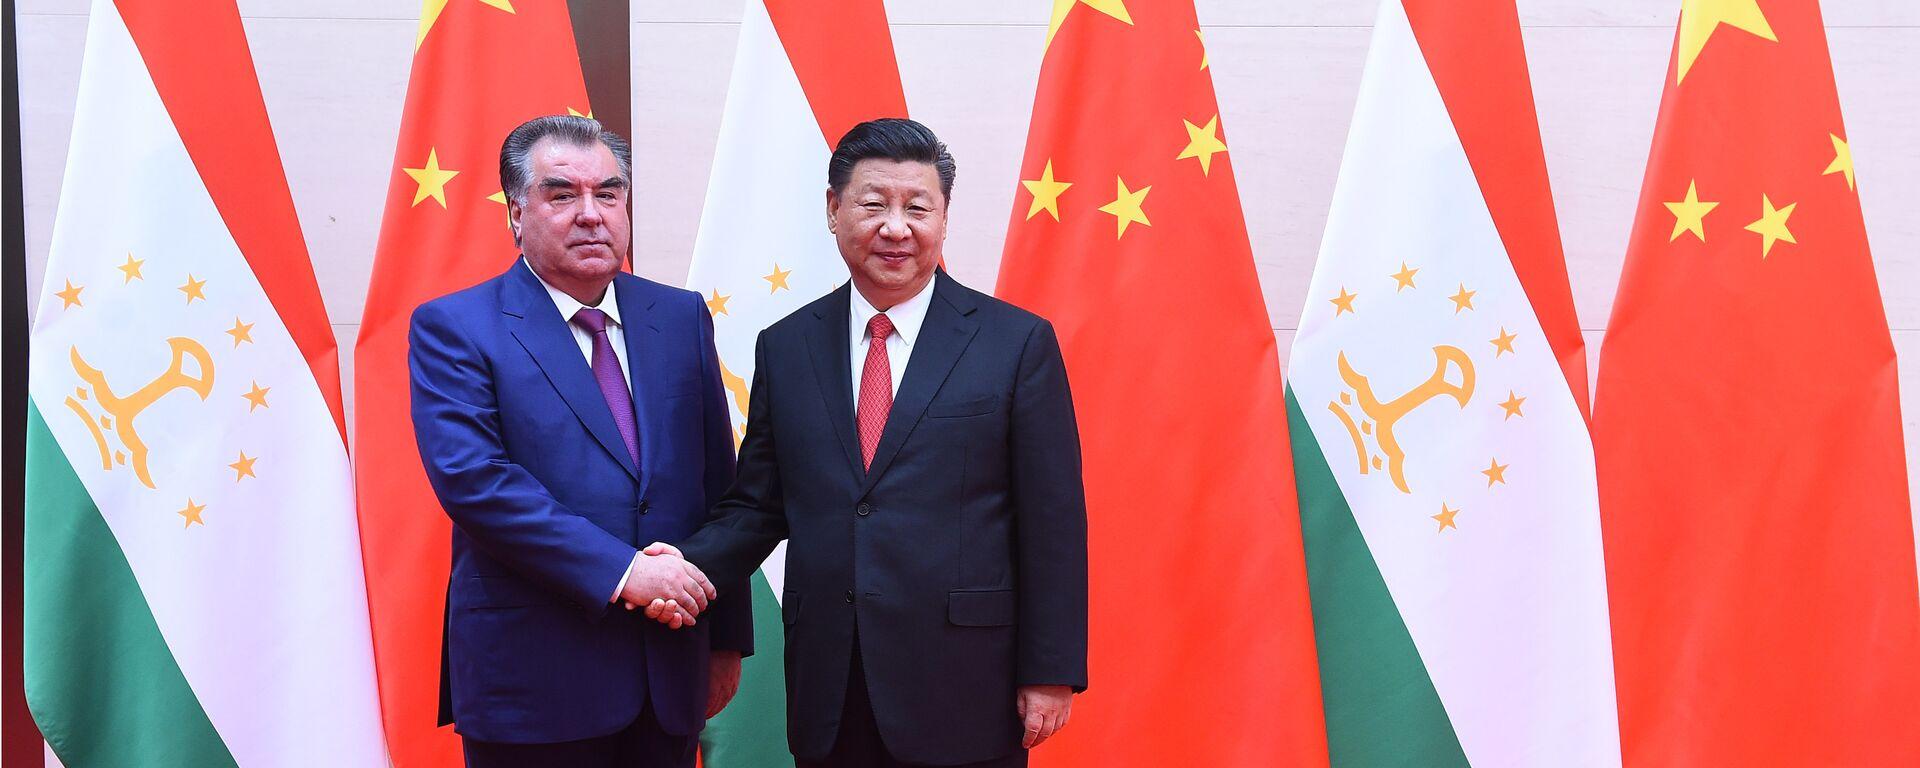 Президент Таджикистана Эмомали Рахмон и председатель КНР Си Цзиньпин - Sputnik Таджикистан, 1920, 07.09.2021